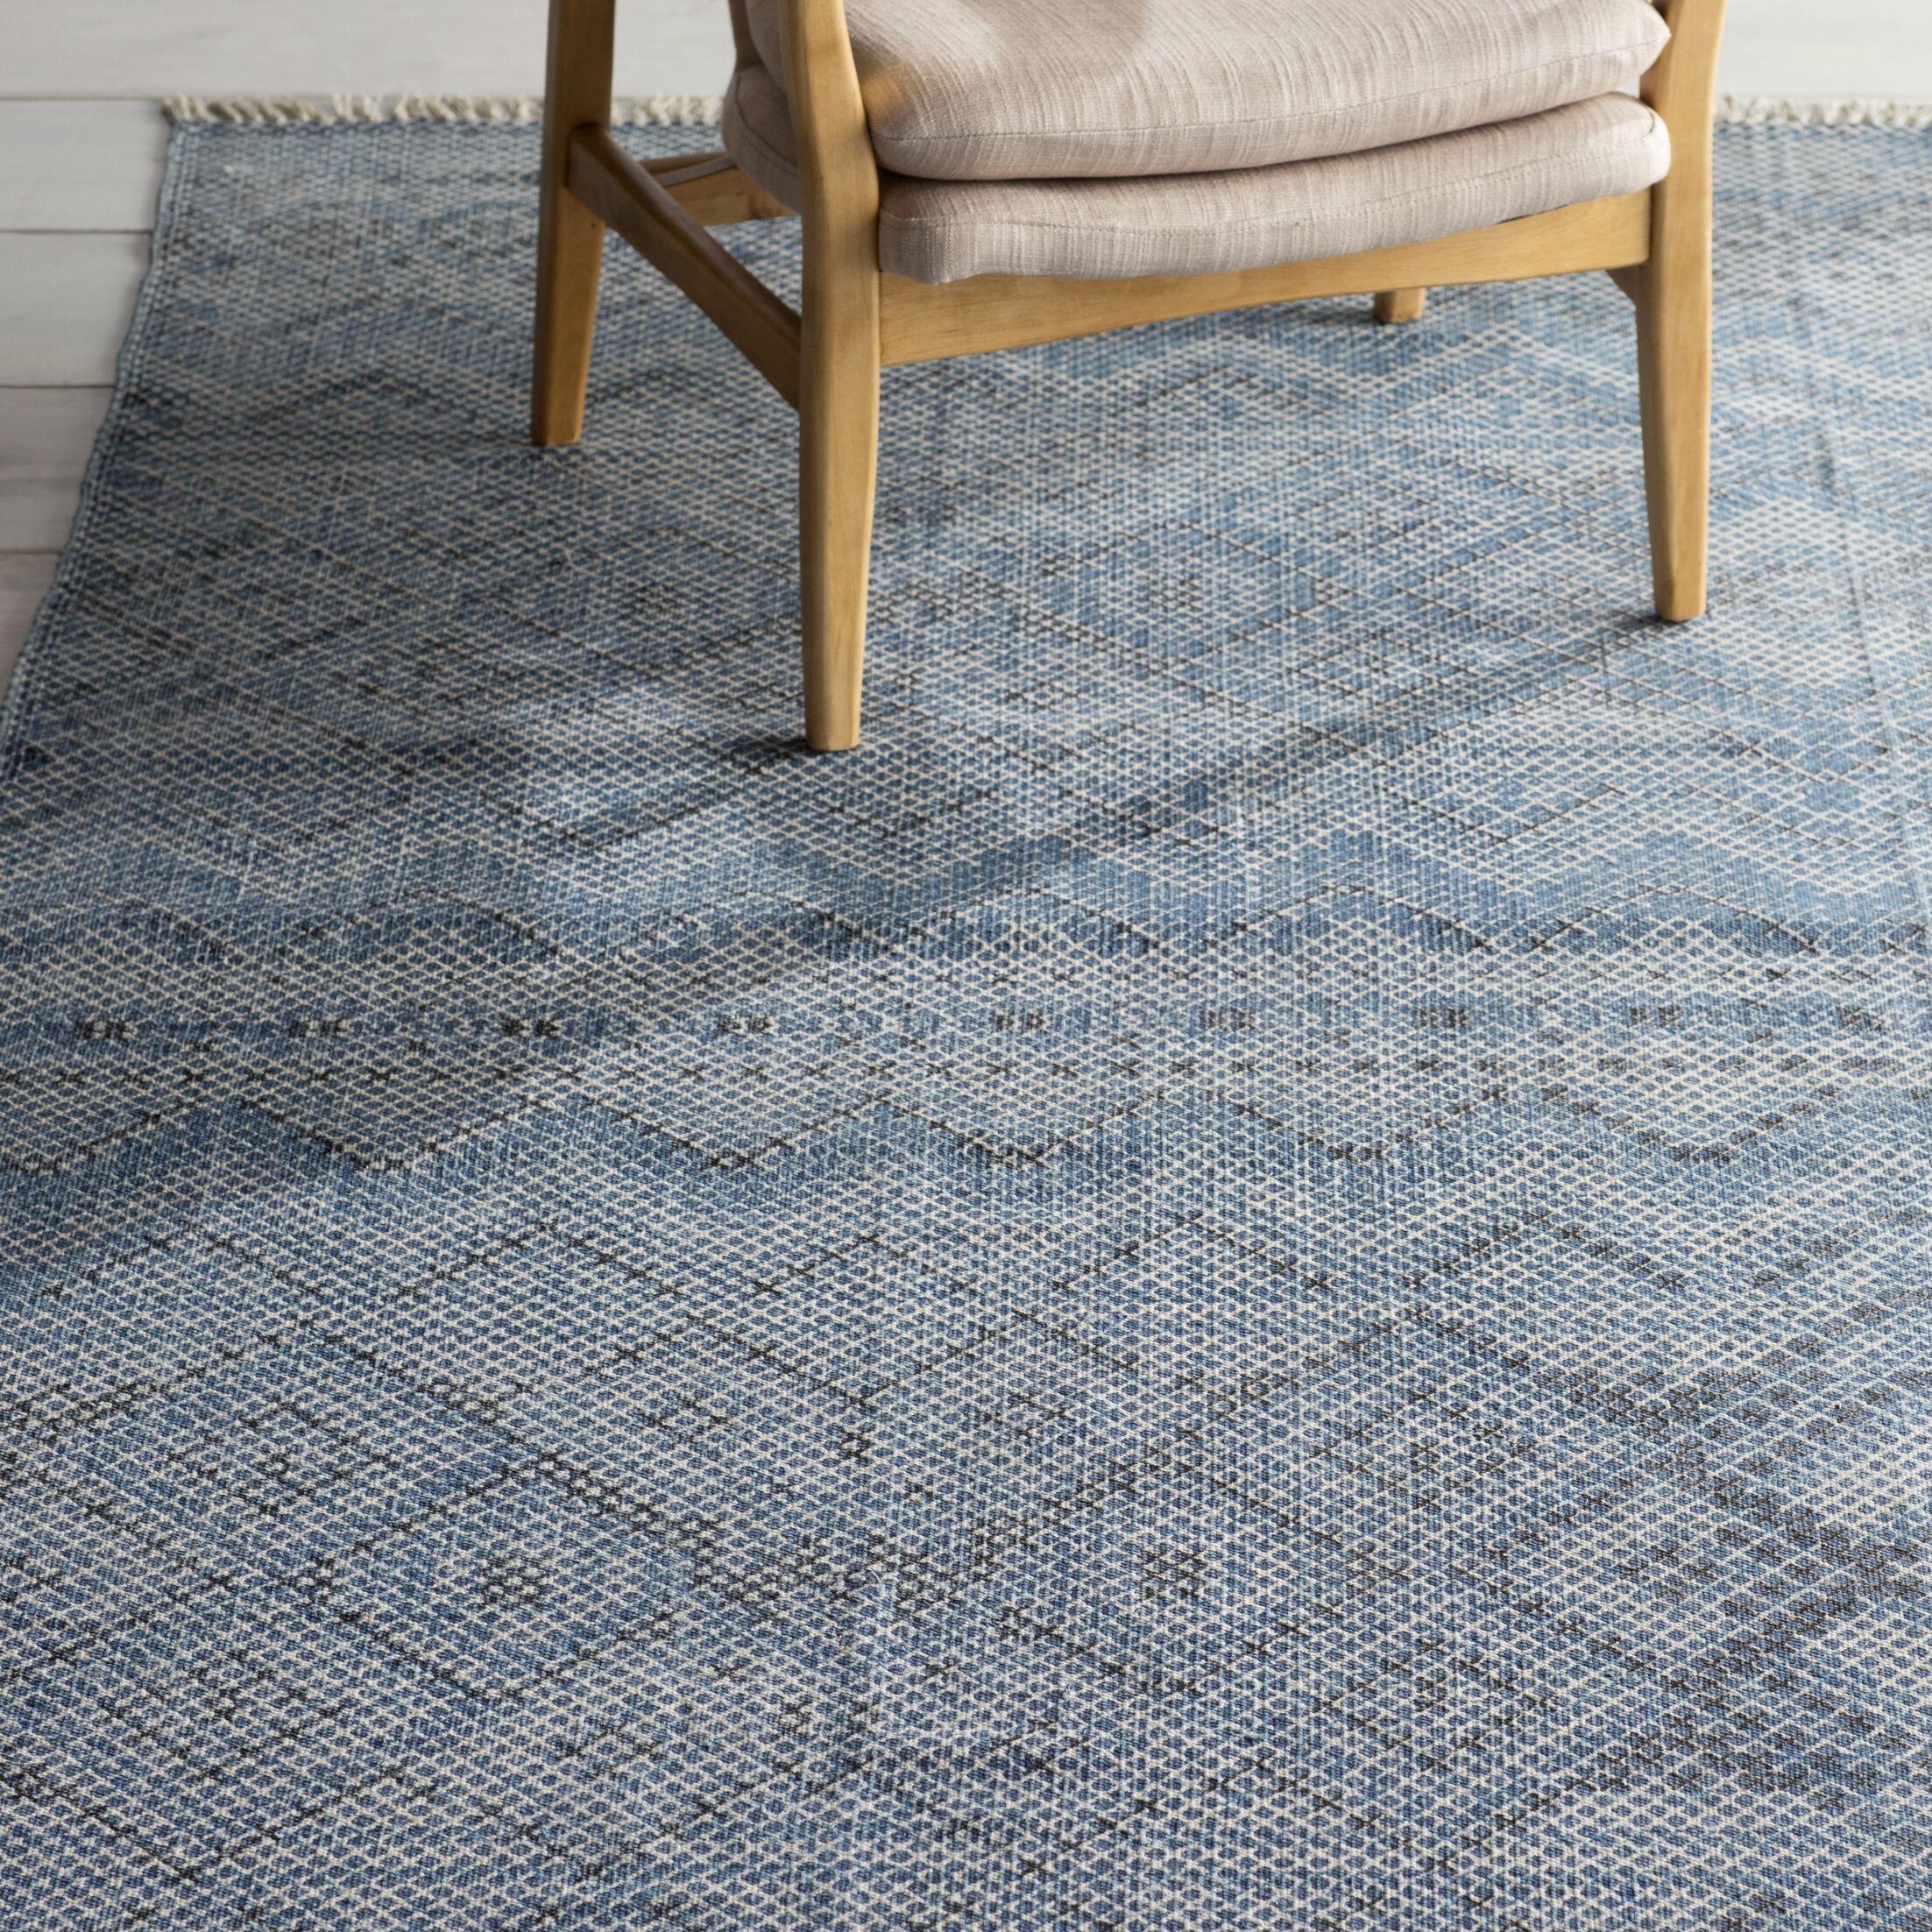 Winona Sky Blue/Navy Area Rug Rug Size: Rectangle 4' x 6'